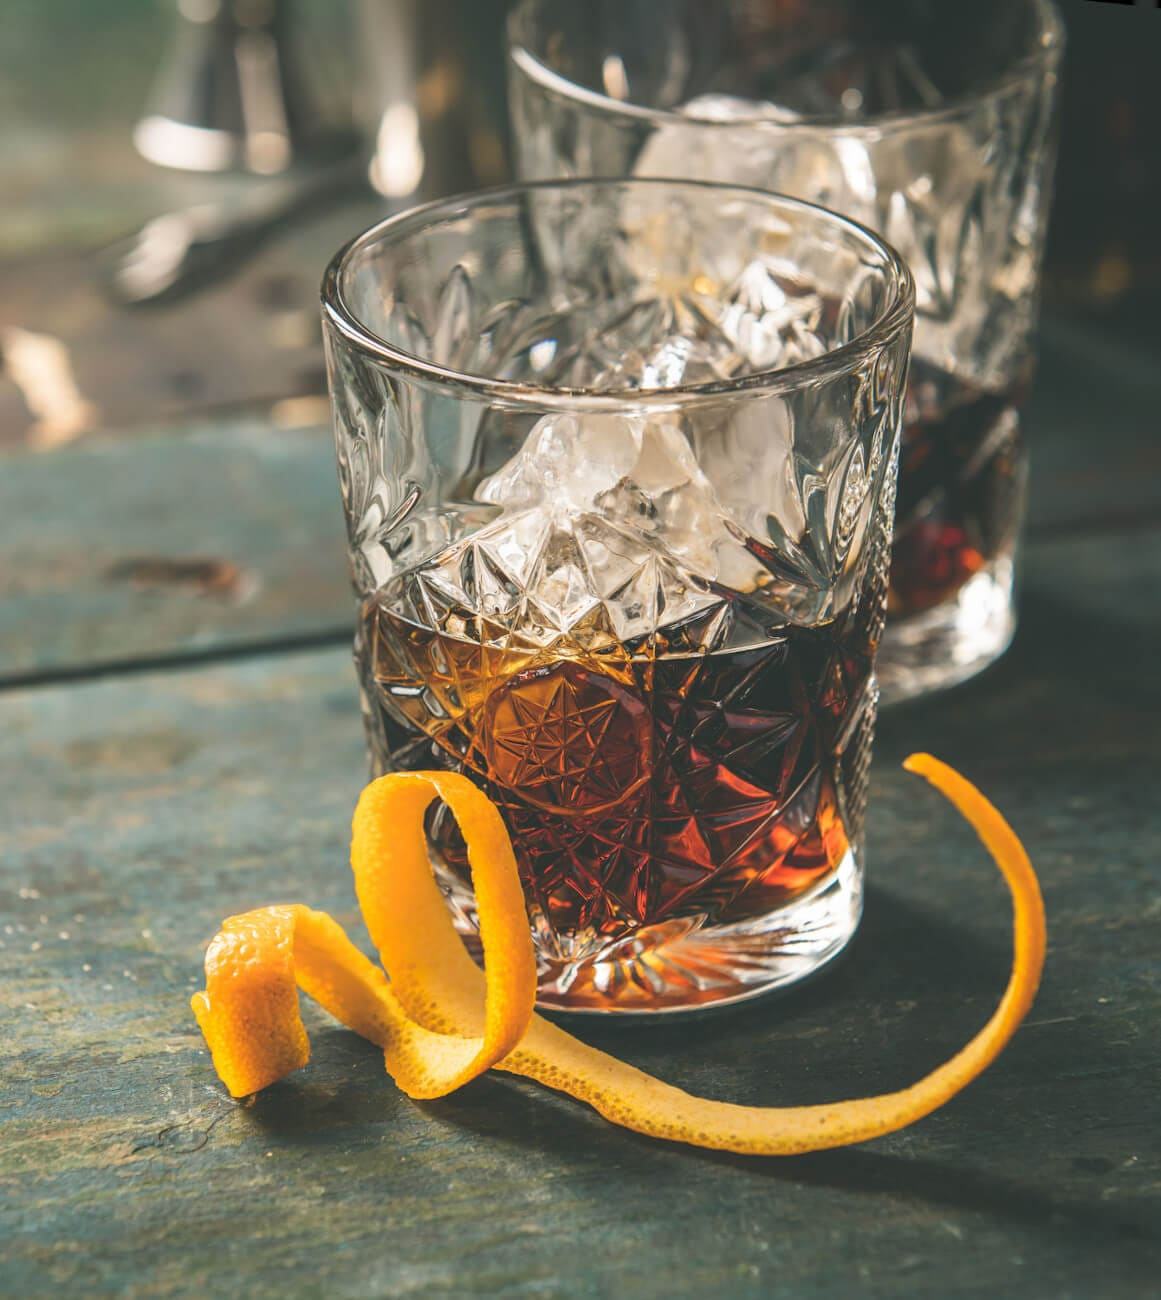 Hampden Rum on the rocks in einem Tumbler